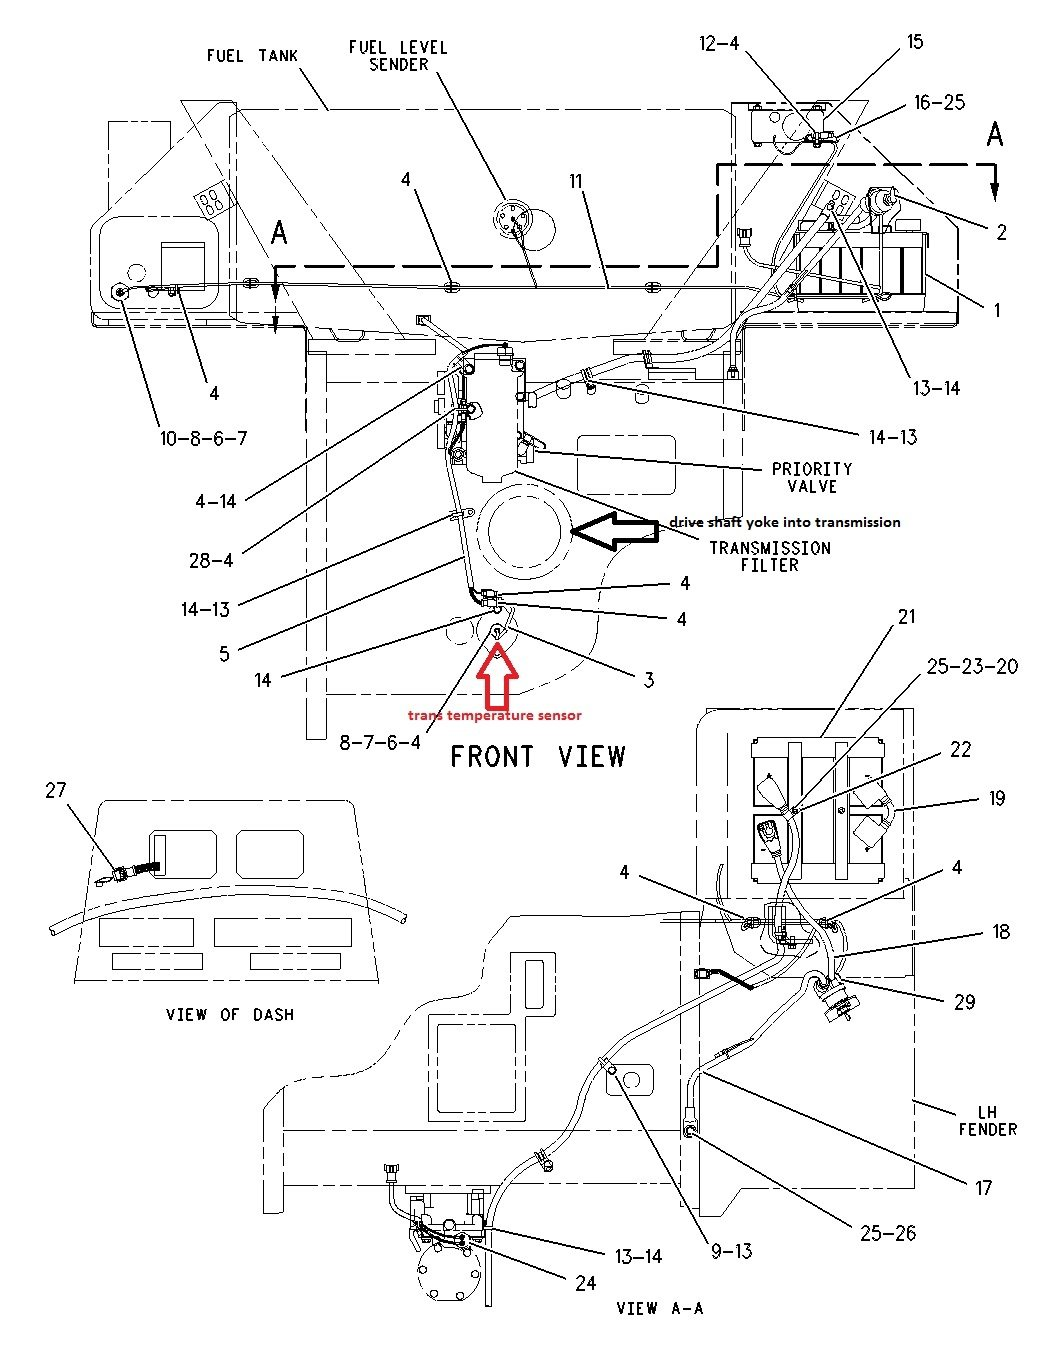 Bobcat S300 Wiring Diagram as well Caterpillar 420e Wiring Diagram besides Case Hydraulic Schematic as well 2009 Polaris Sportsman 500 Ho 4x4 Atv Voltage Regulator Rectifier in addition Kubota V2203 Wiring Diagram. on cat skid steer wiring diagram